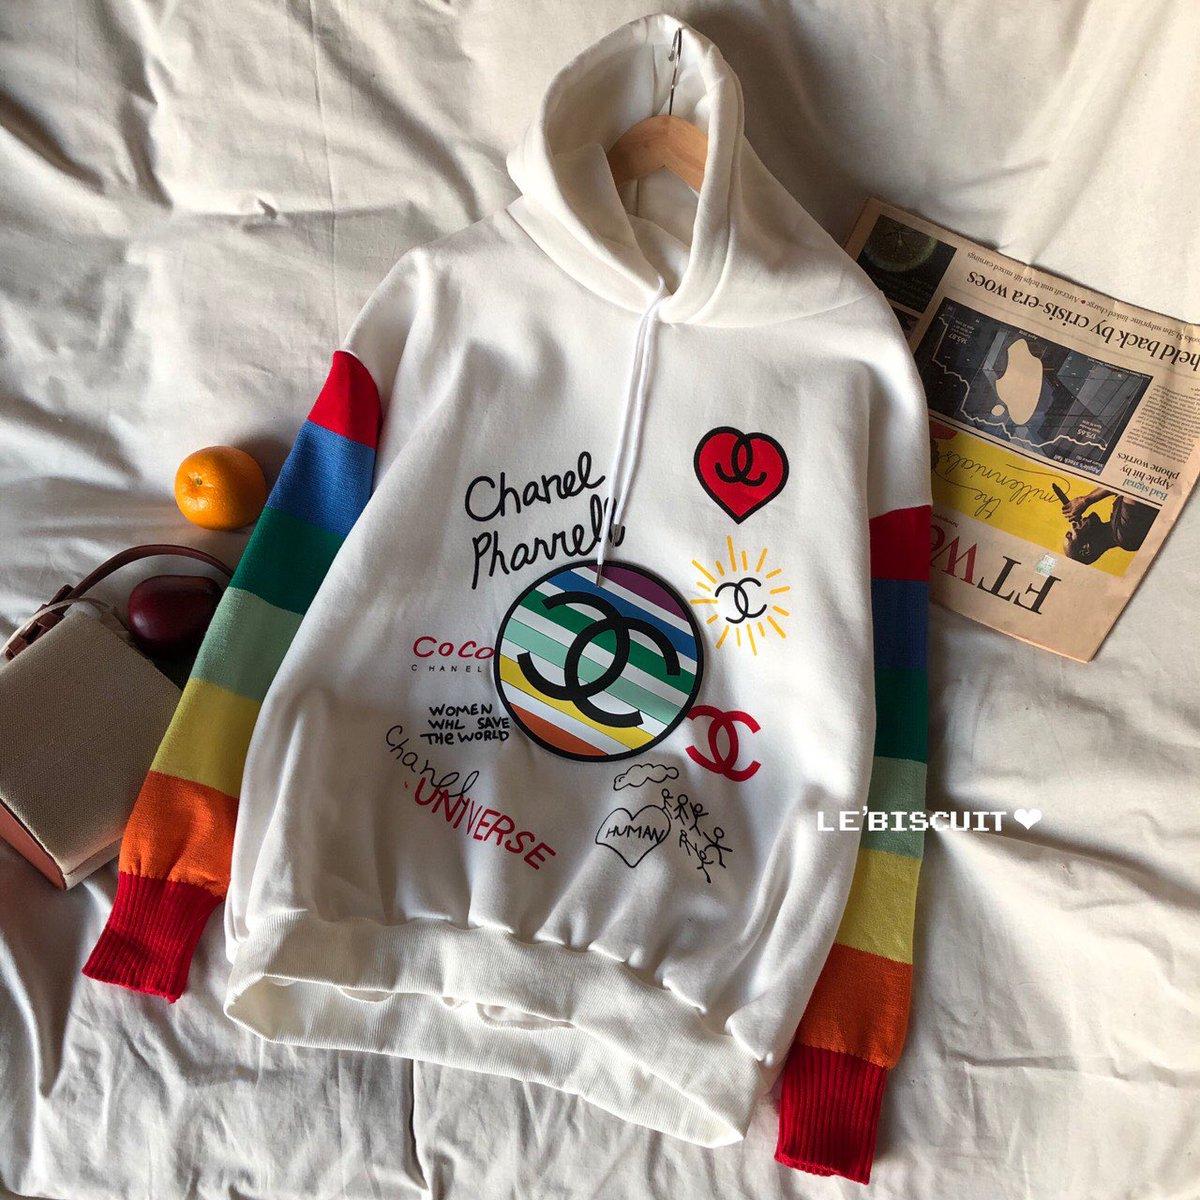 "#fynfashion  #ChanelPharrell  🇰🇷 #เสื้อHoodieทรงoversize  จากแบรนด์ดัง ลาย Chanel Pharrell ผ้า Sweater  ❤️ งานนำเข้า ❤️ Freesize อก : 52"" ยาว : 28"" รอบแขน 14-26"" ❤️ ราคา 560 บาท https://t.co/oZlkIPBLoD"